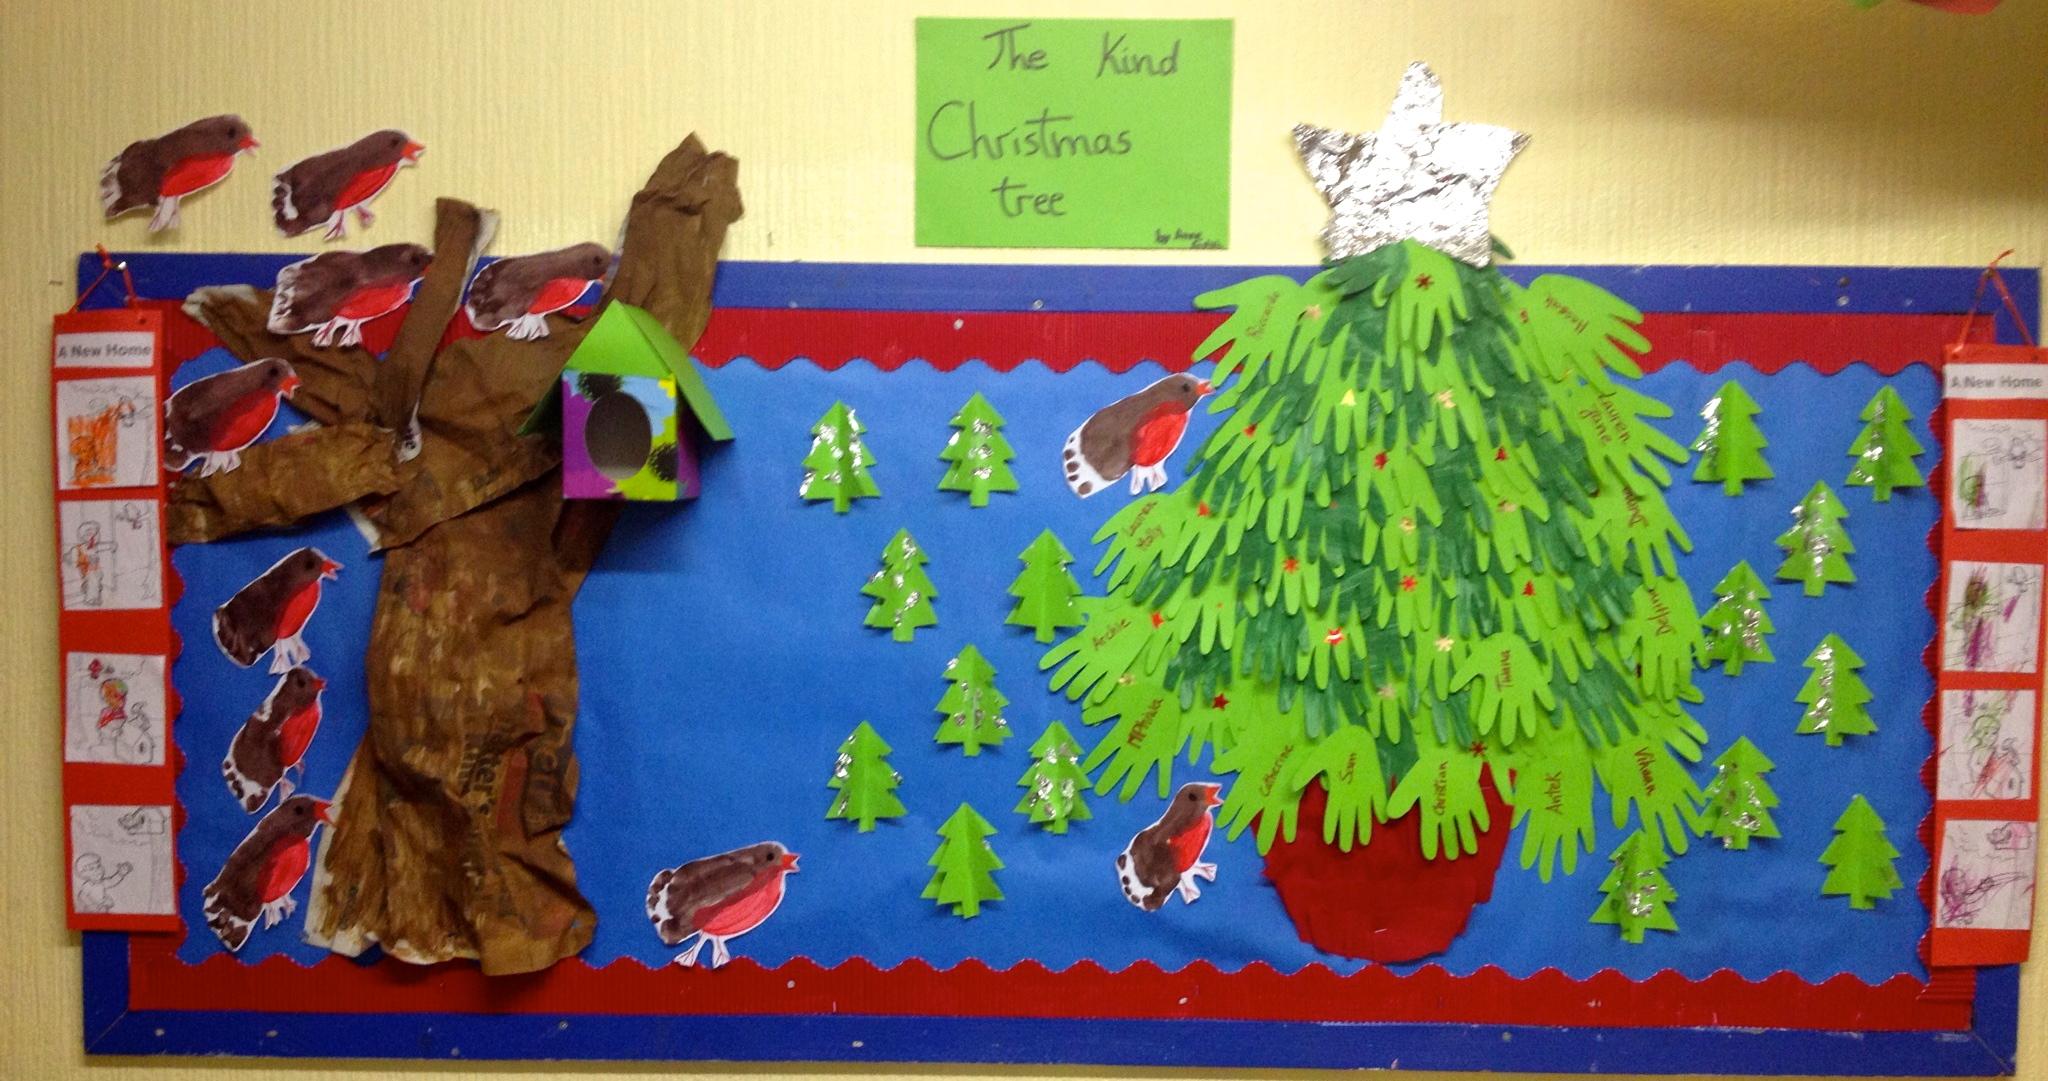 The Kind Christmas Tree Board